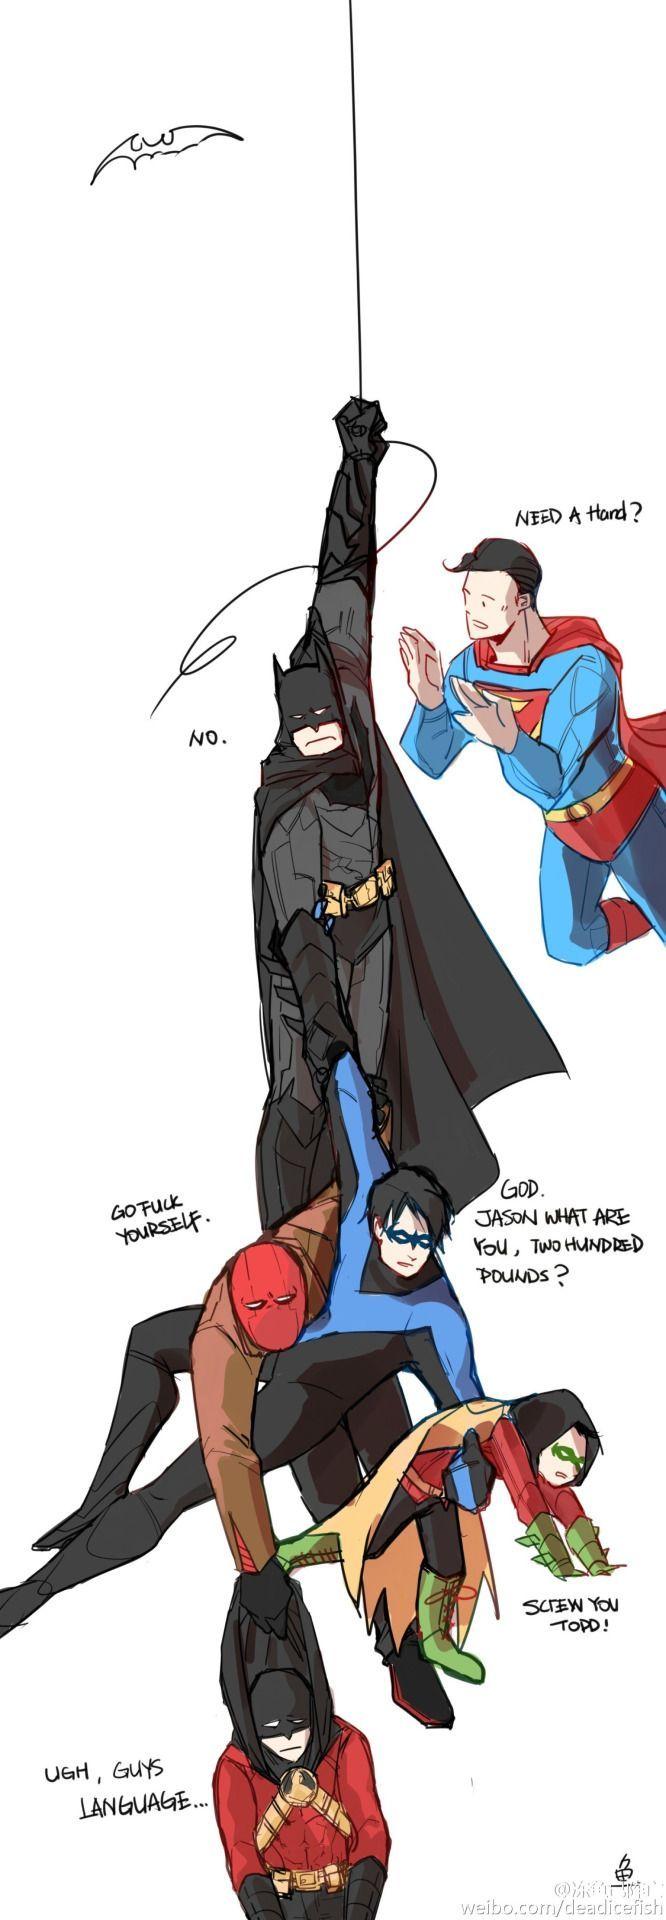 Batfamily. Batman. Nightwing. Red Hood. Red Robin. Robin. Ahahaha. These idiots. - Visit to grab an amazing super hero shirt now on sale!